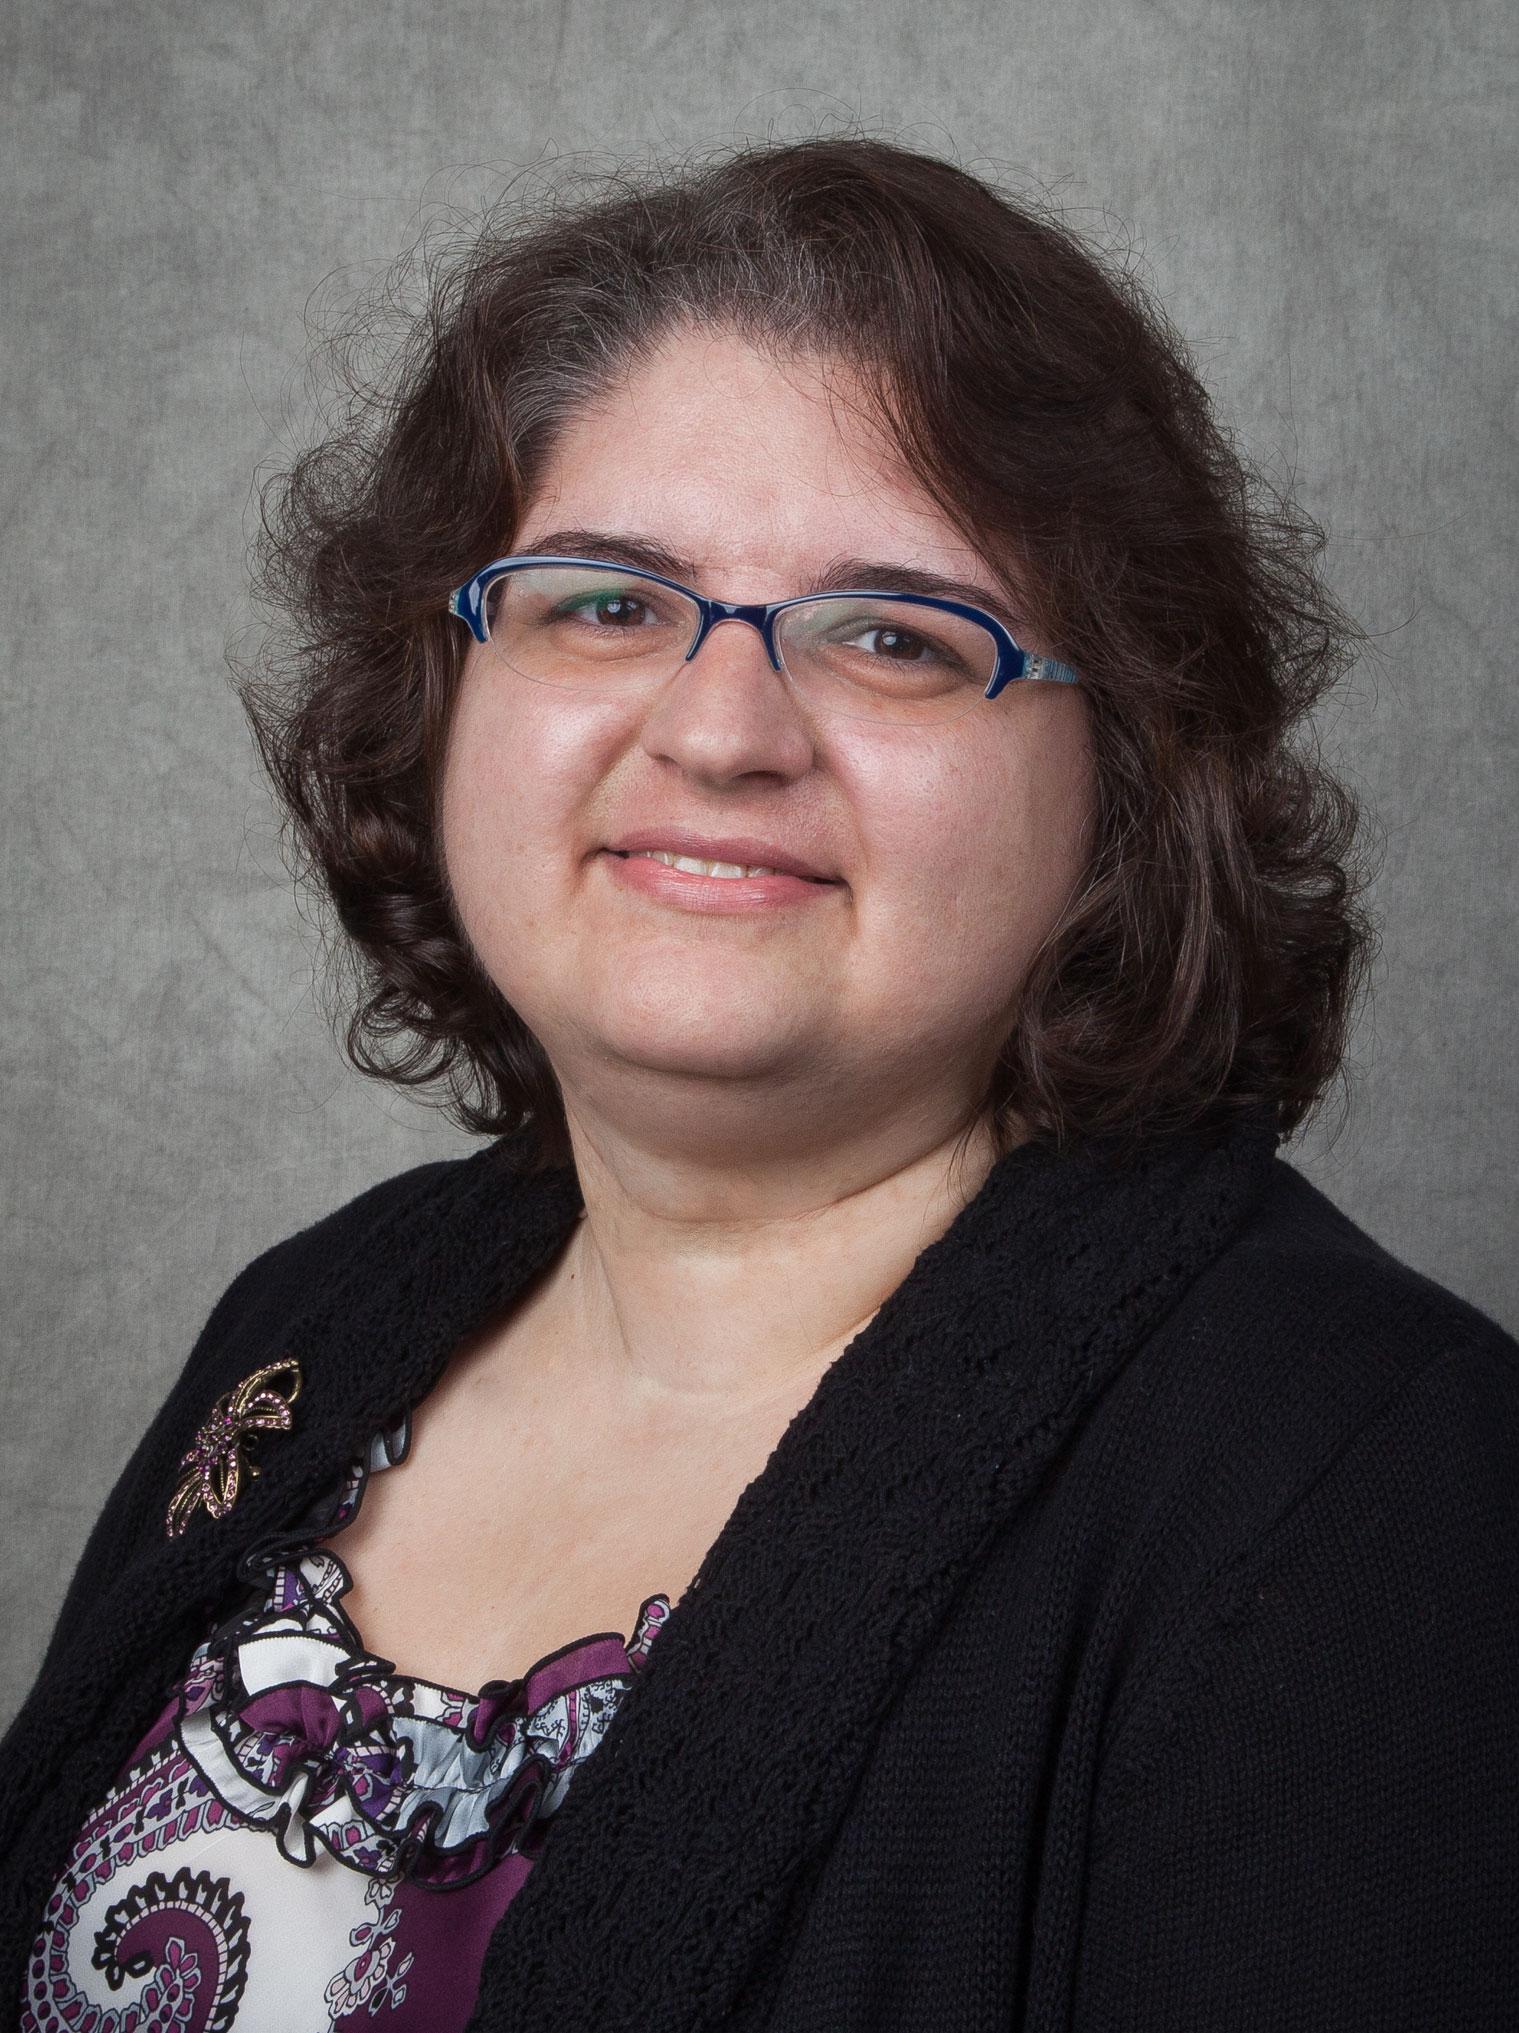 Laura Racovita-Szilagyi, PhD